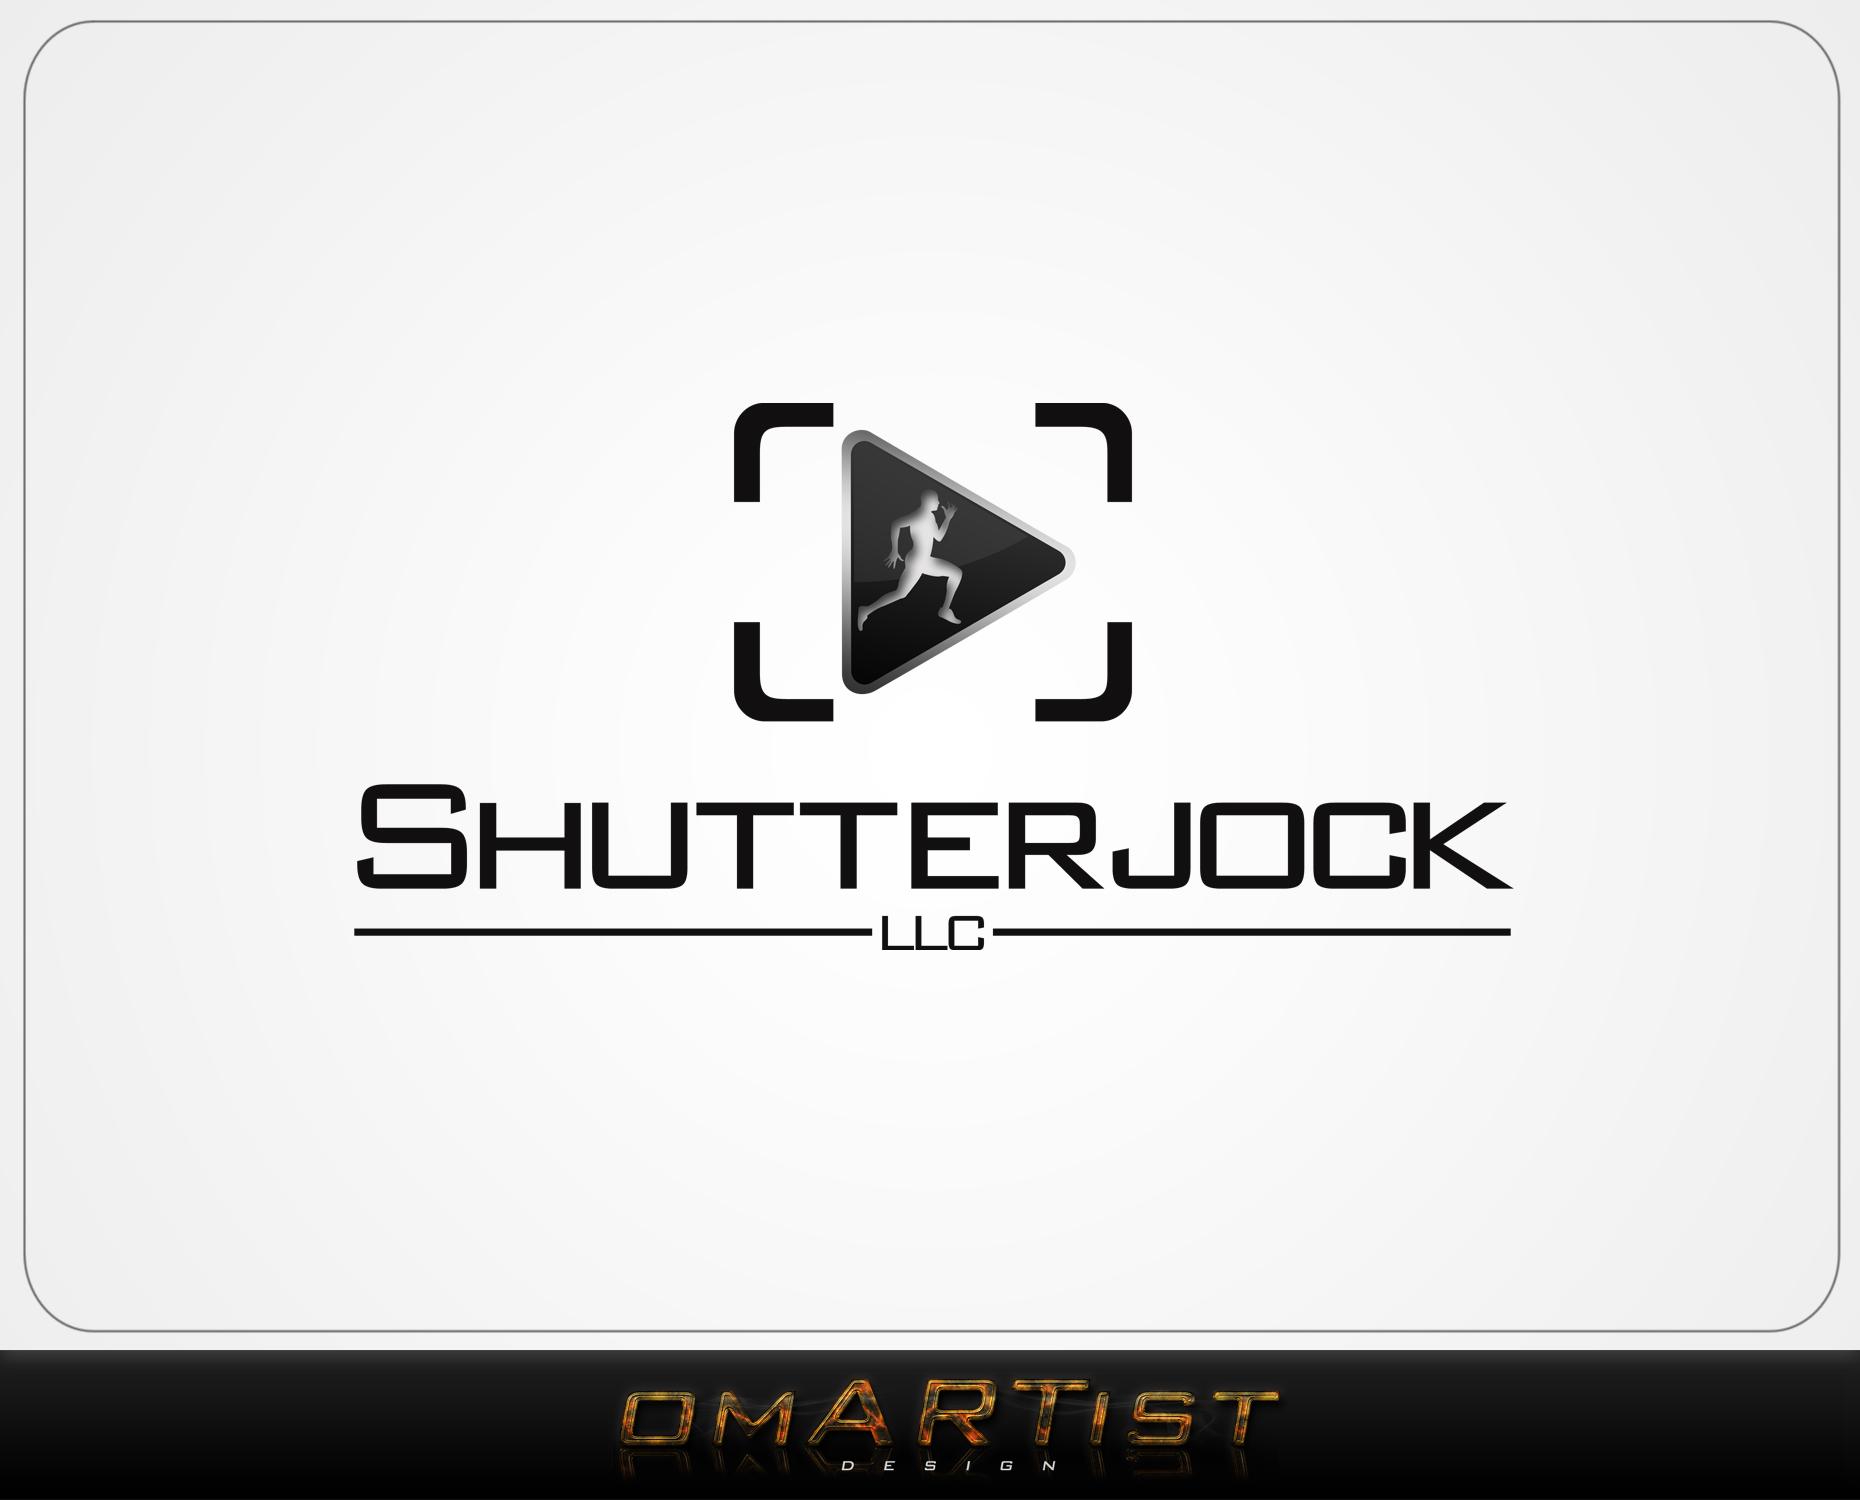 Logo Design by omARTist - Entry No. 104 in the Logo Design Contest Unique Logo Design Wanted for Shutterjock LLC.